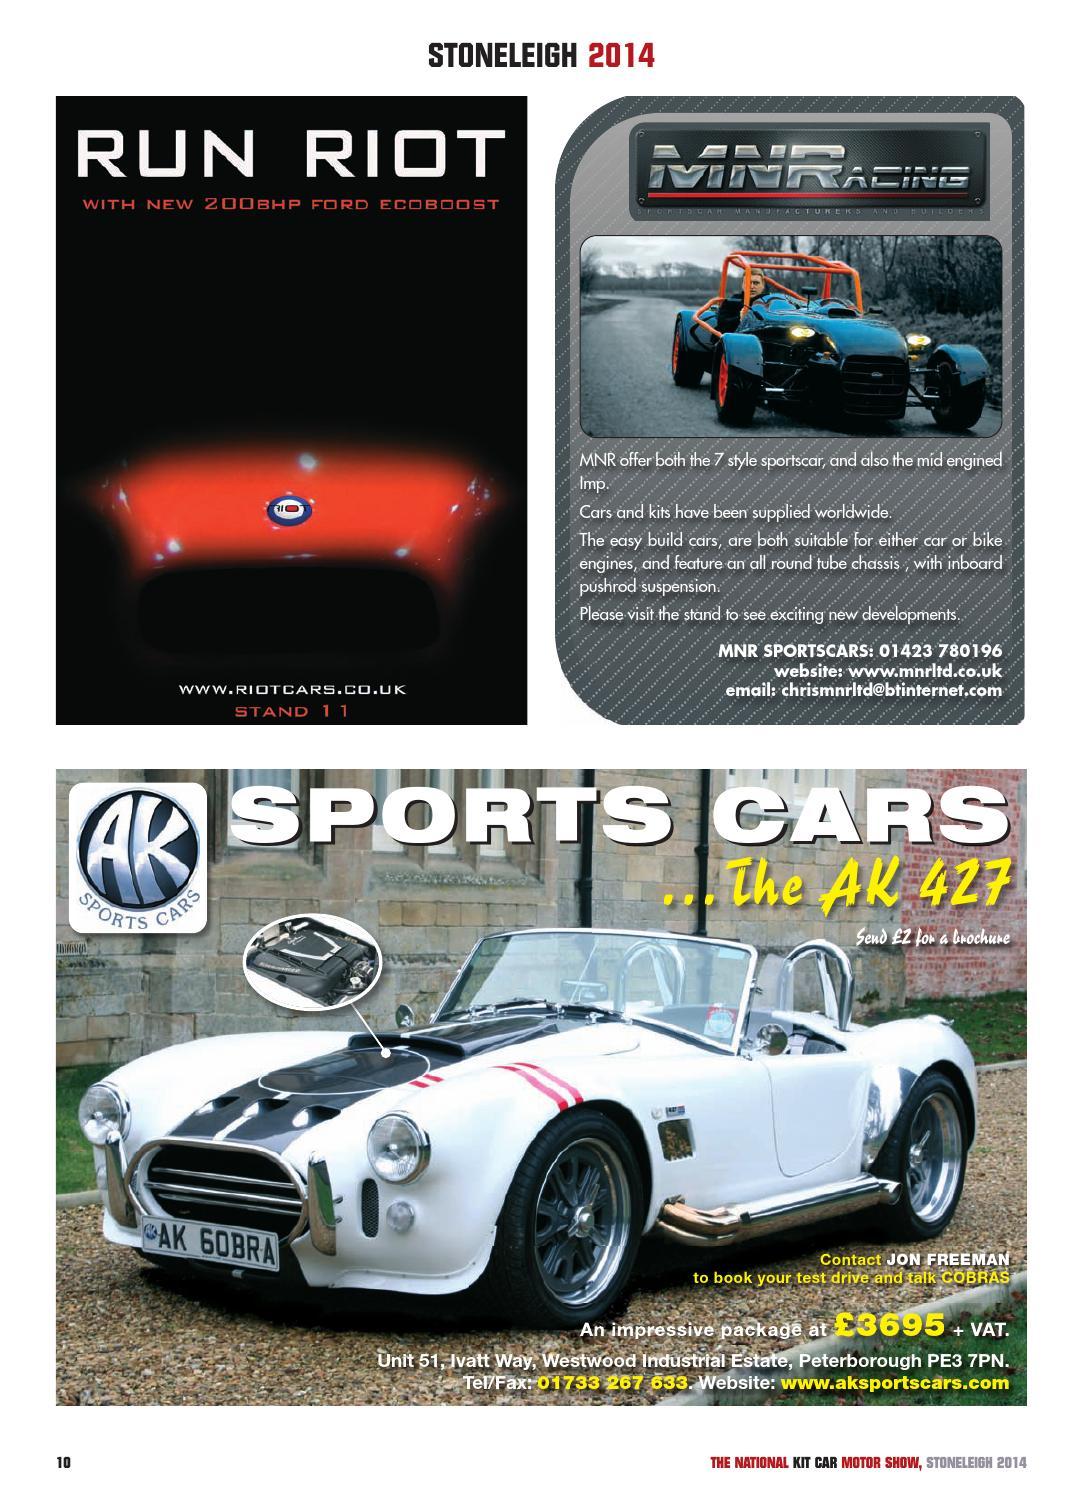 Stoneleigh National Kit Car Show Guide 2014 by Panda Creative Ltd